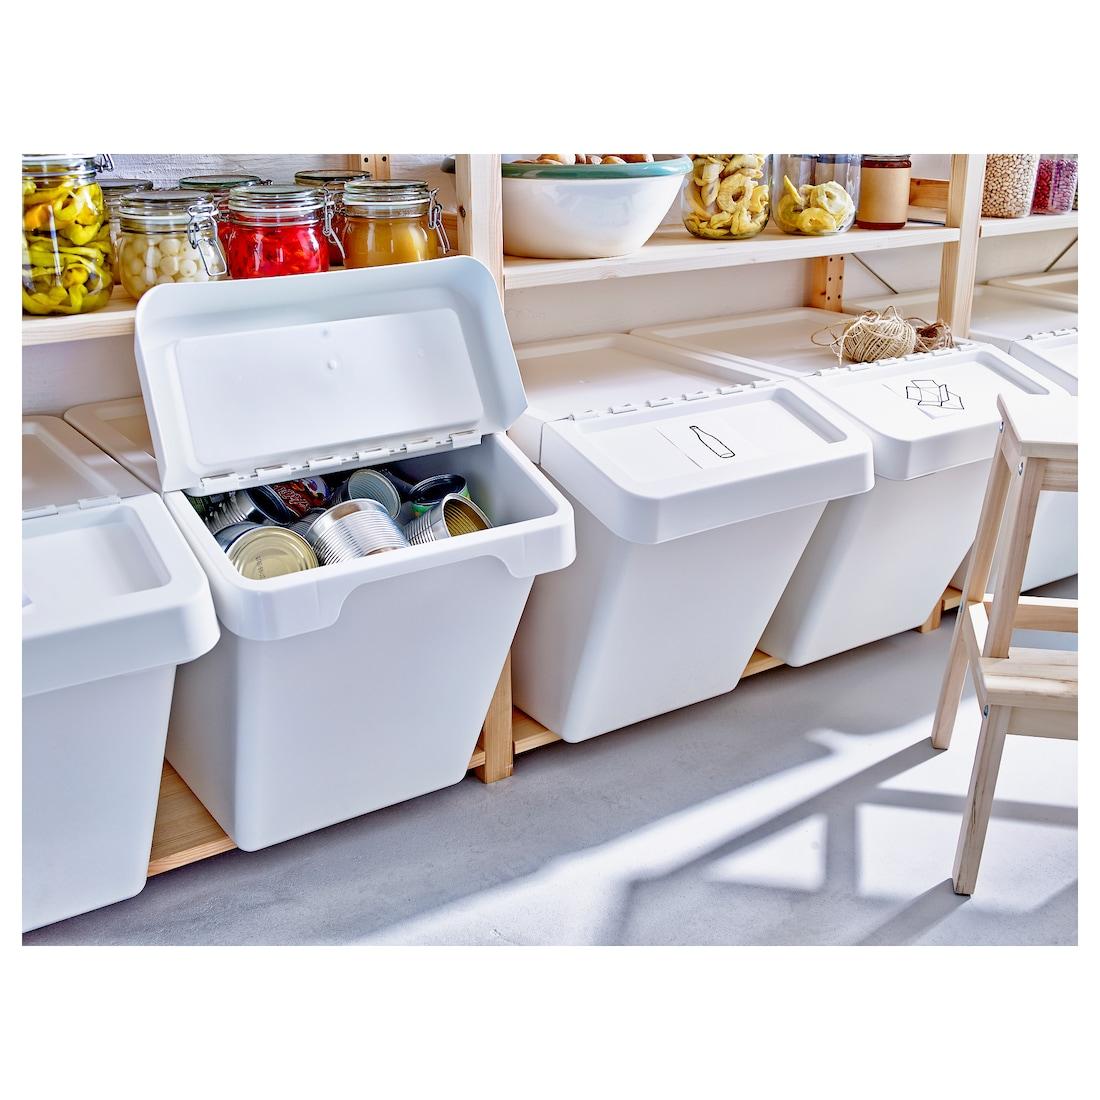 sortera-waste-sorting-bin-with-lid-white__0369163_PH119828_S5